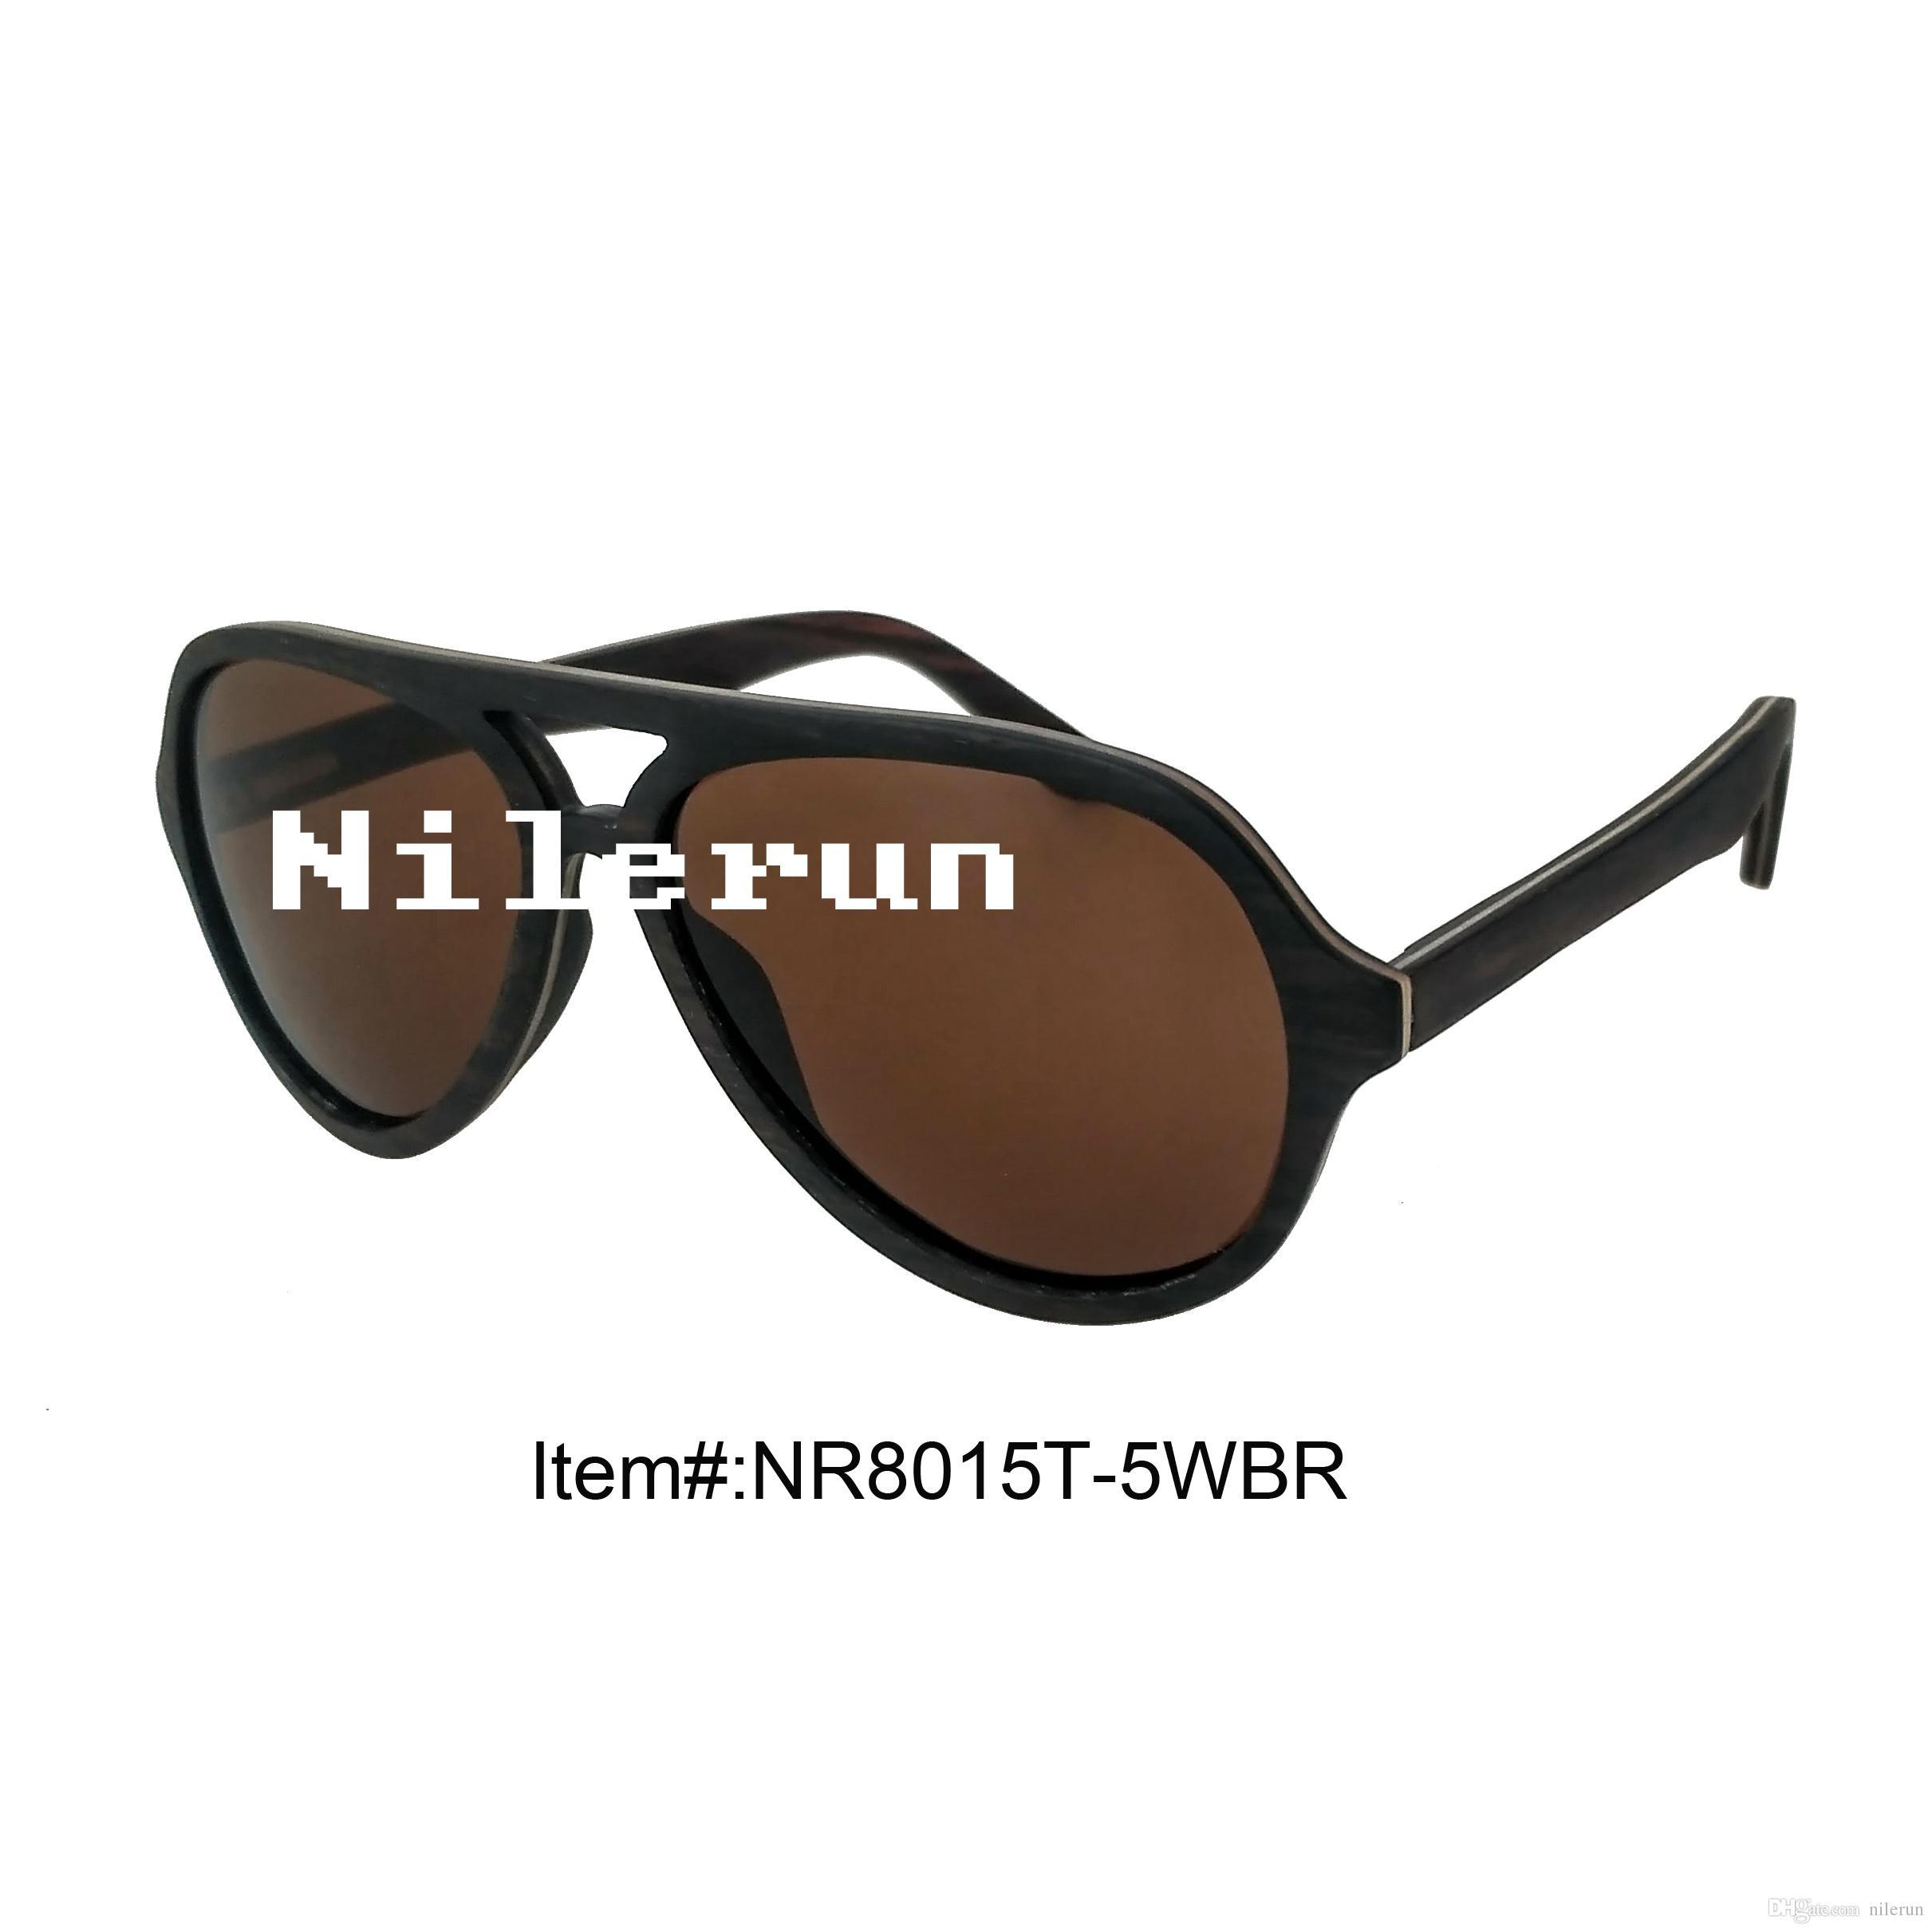 384e2019d Fashion Thin Unisex Pilot Style Brown Polarized Lens Skateboard Wood  Sunglasses Heart Shaped Sunglasses Mirrored Sunglasses From Nilerun, $19.1|  Dhgate.Com